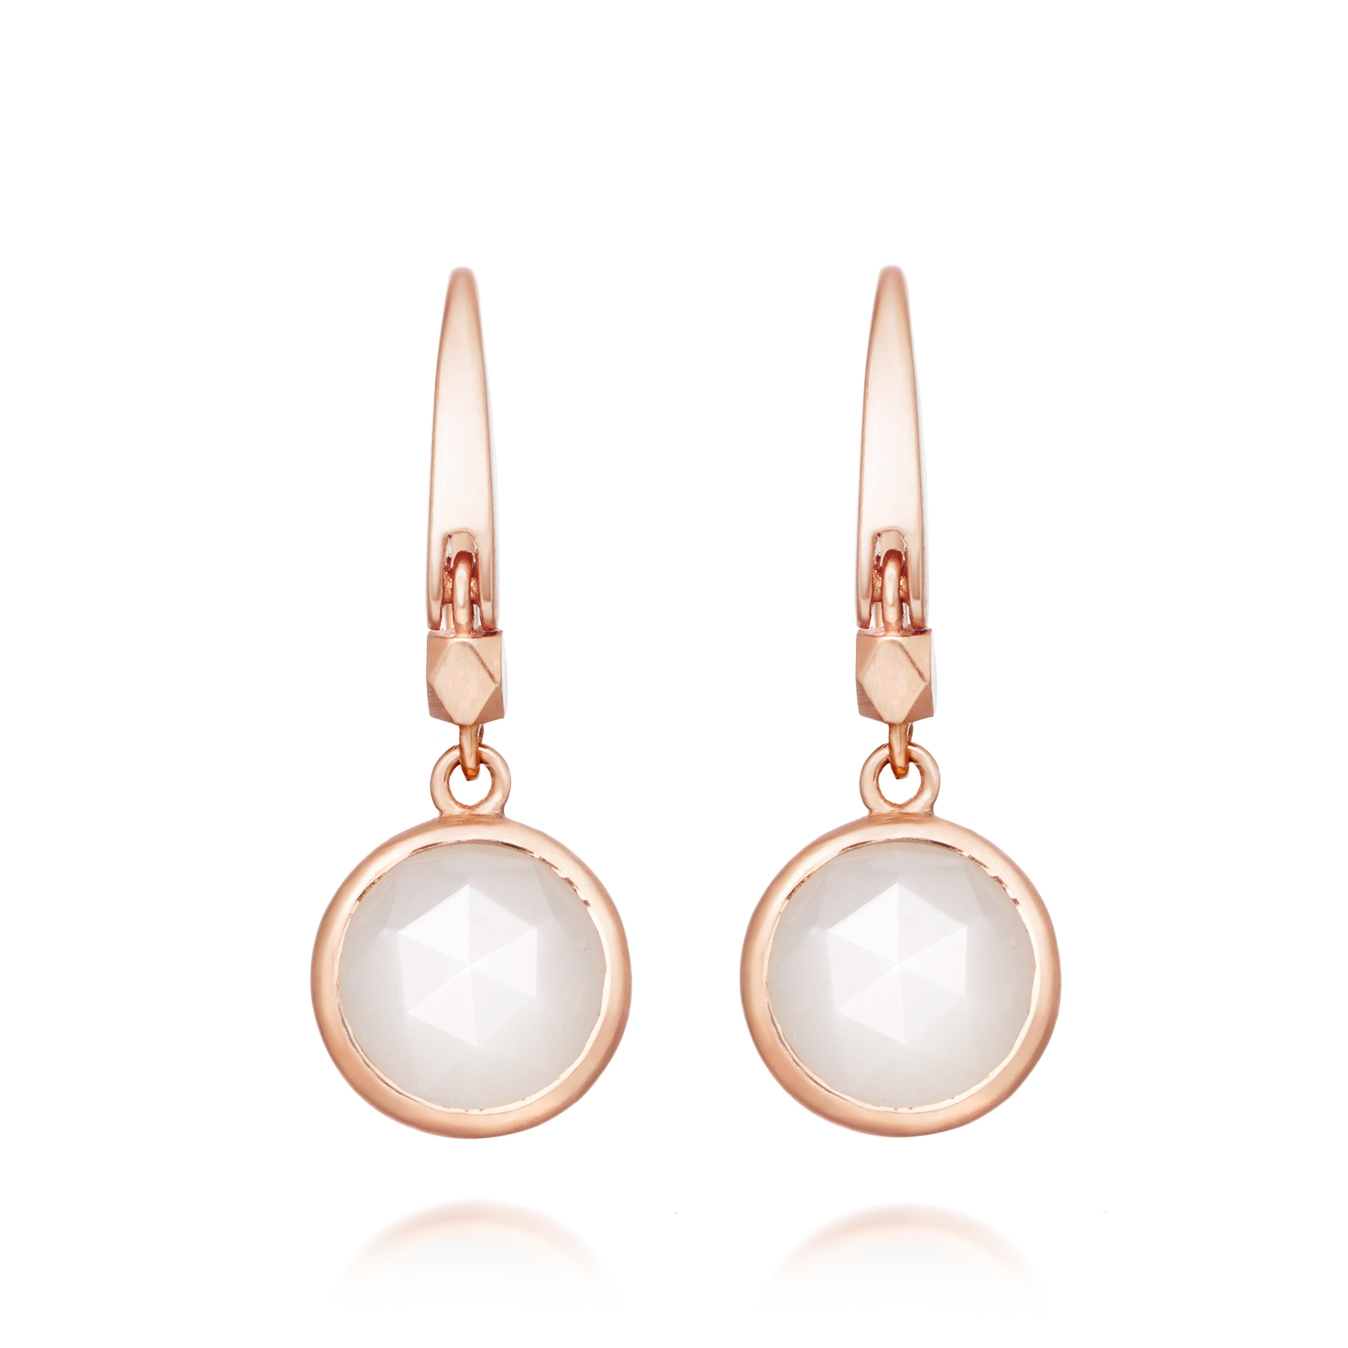 Mini Moonstone Round Stilla Drop Earrings